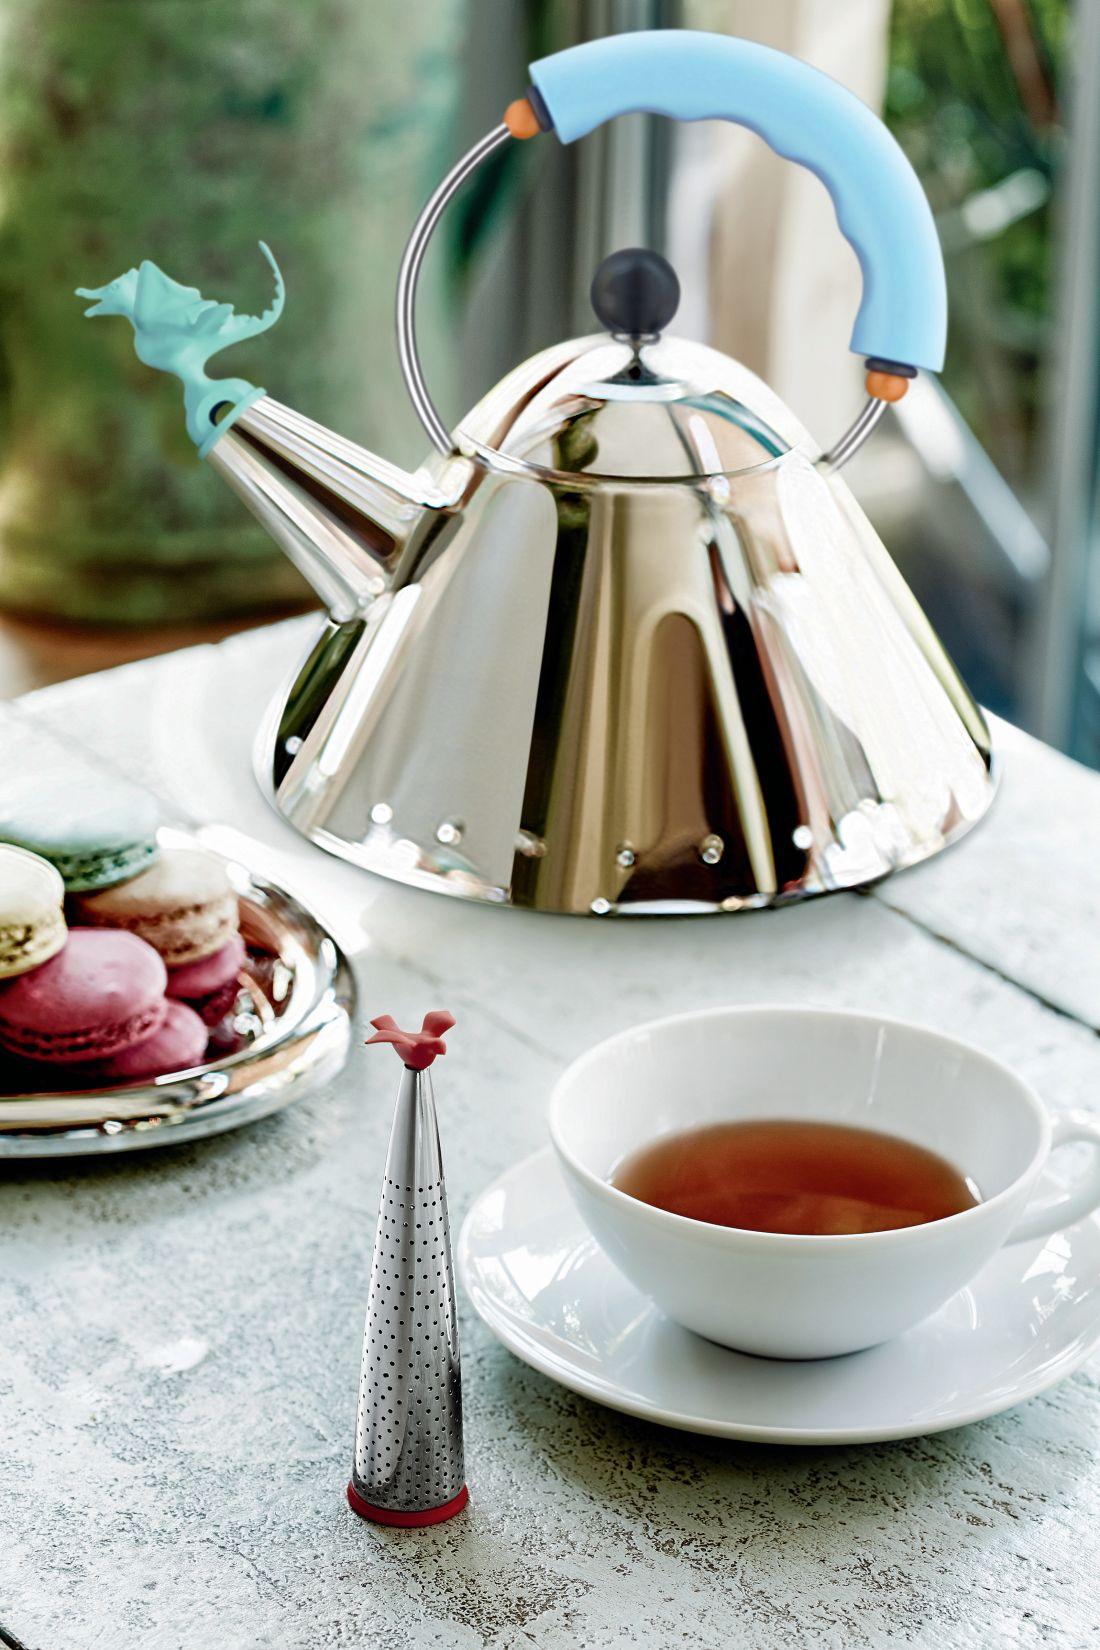 15black-by-design-ltd_alessi-tea-rex-hob-kettle-blue.jpg